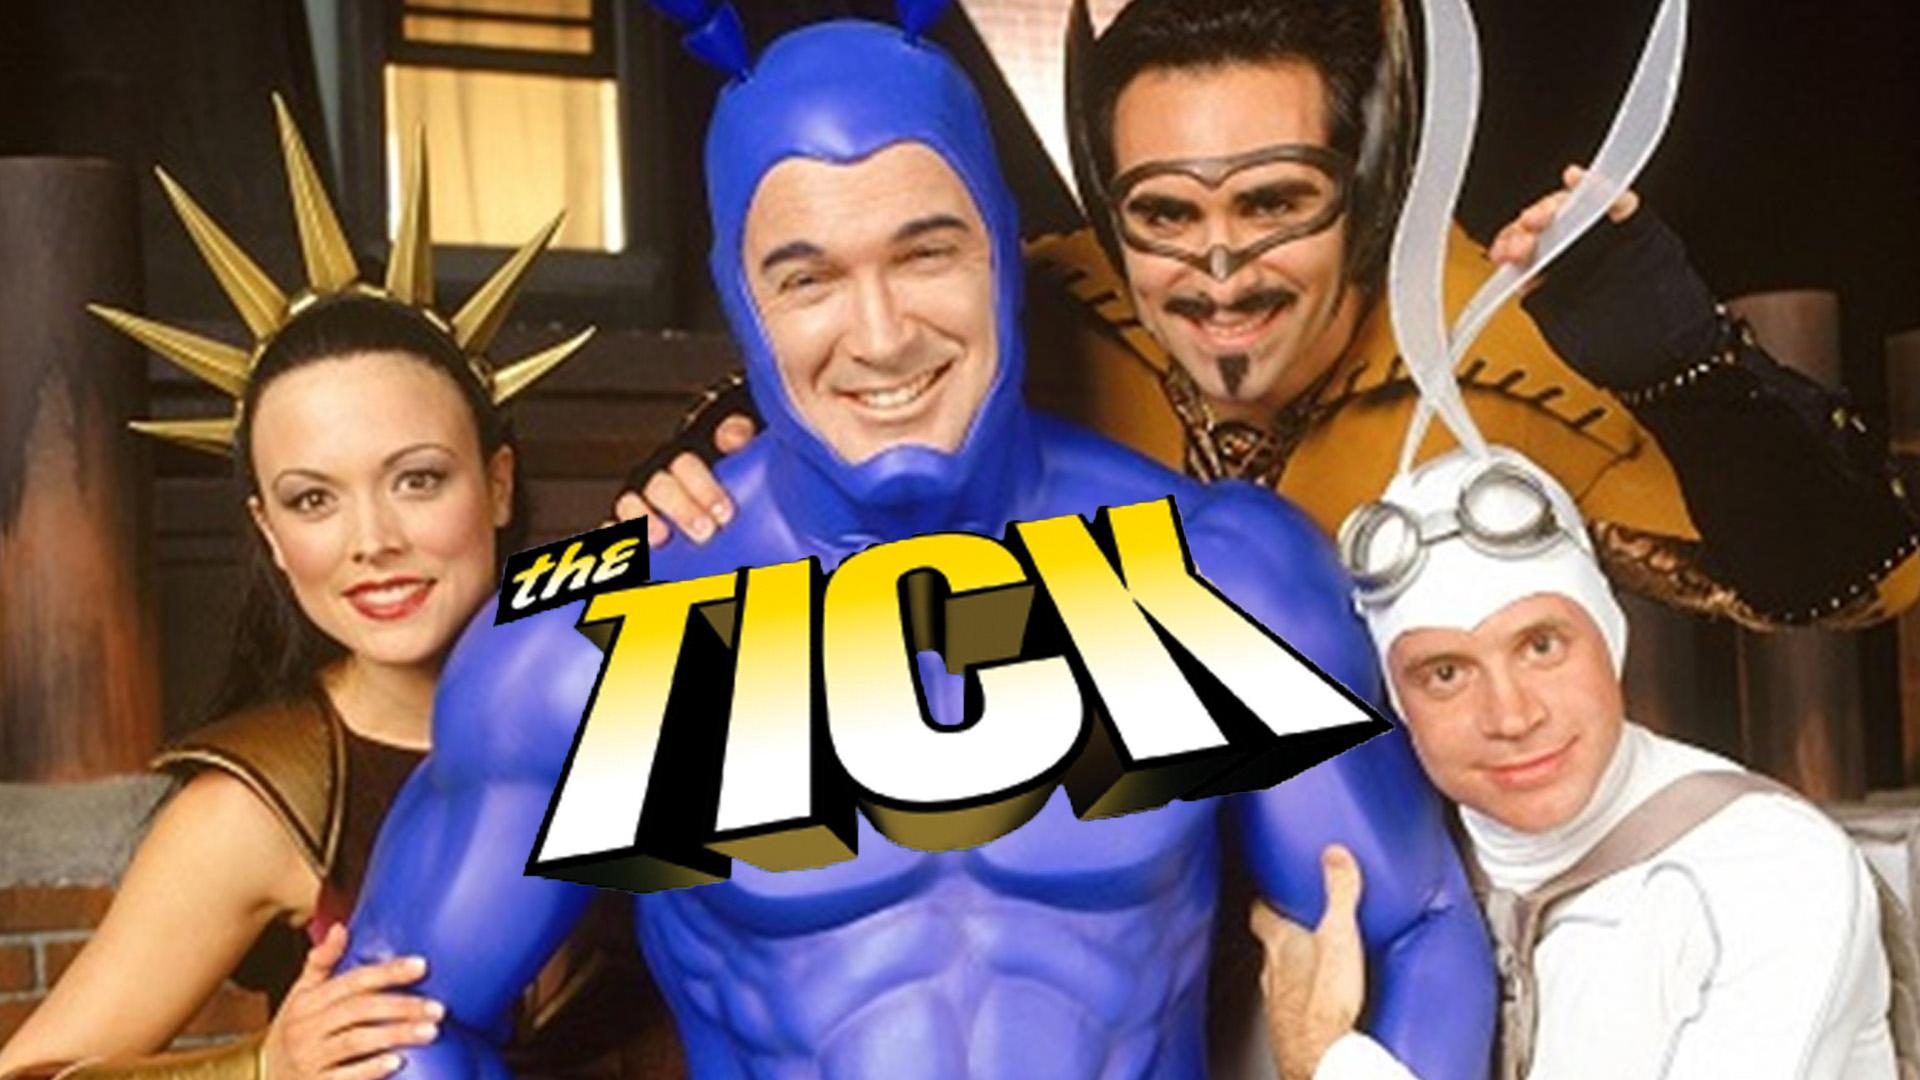 The Tick Season 1